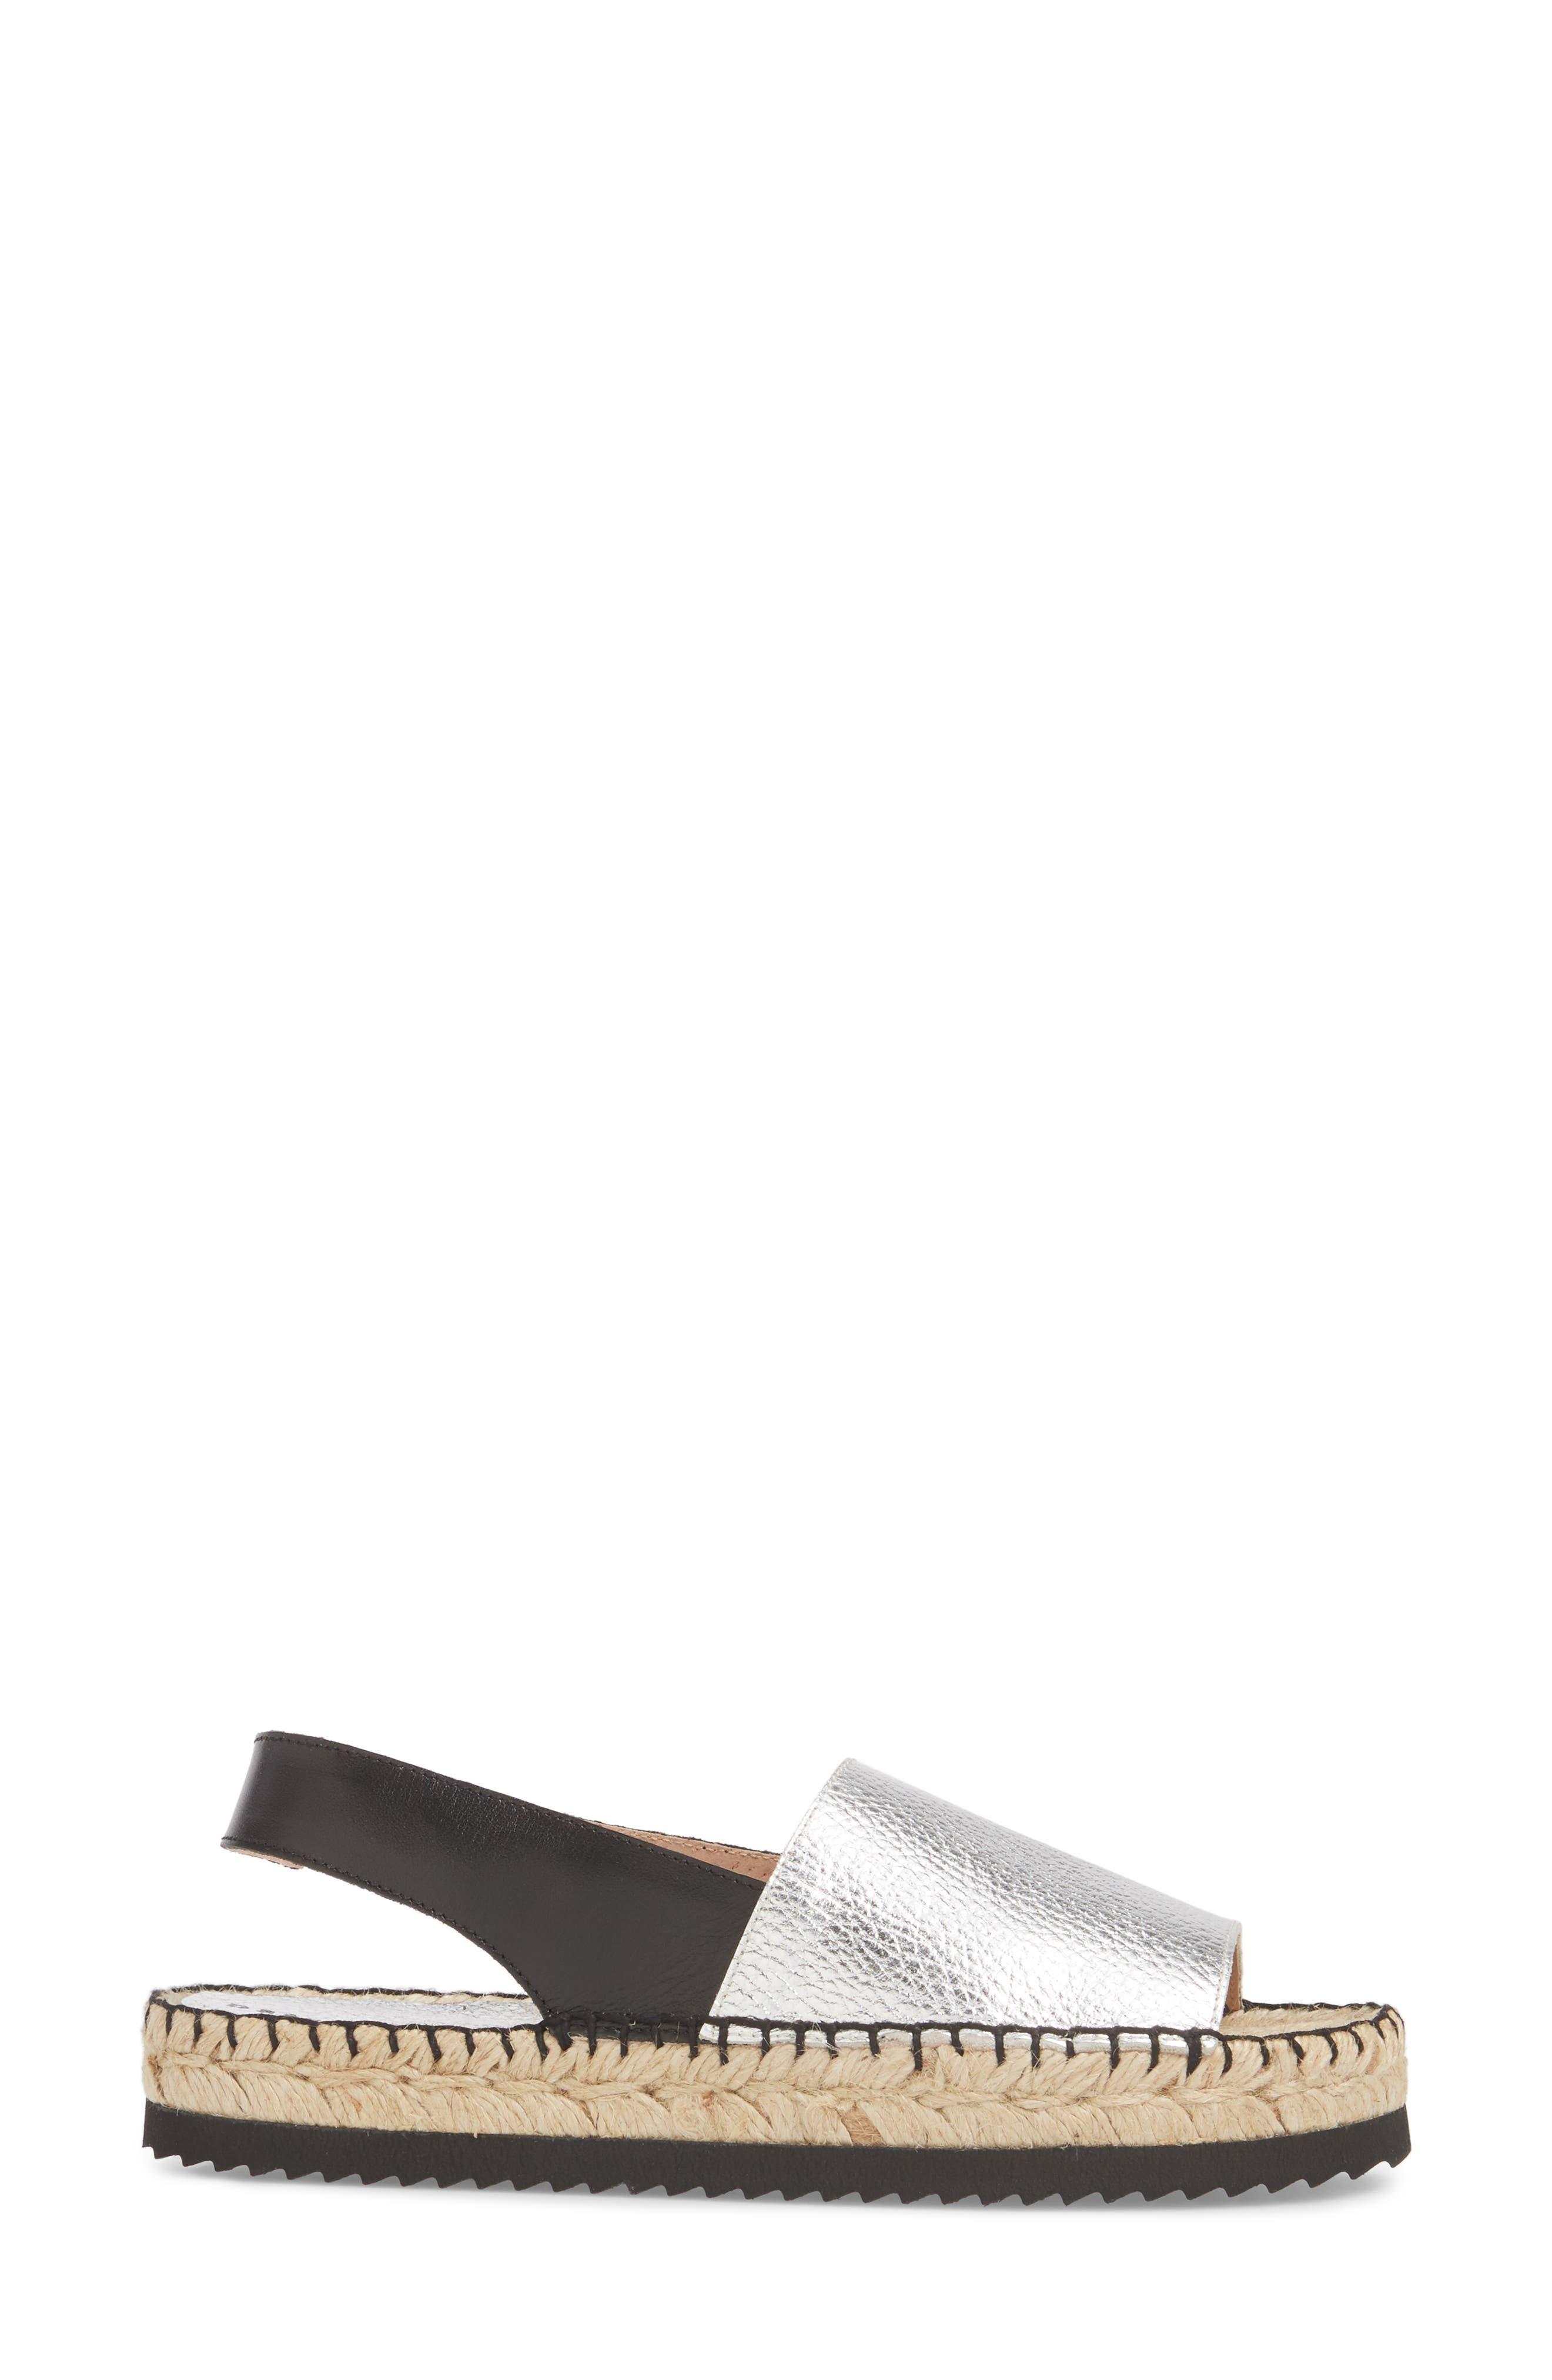 Soho Platform Espadrille Sandal,                             Alternate thumbnail 3, color,                             Silver Suede